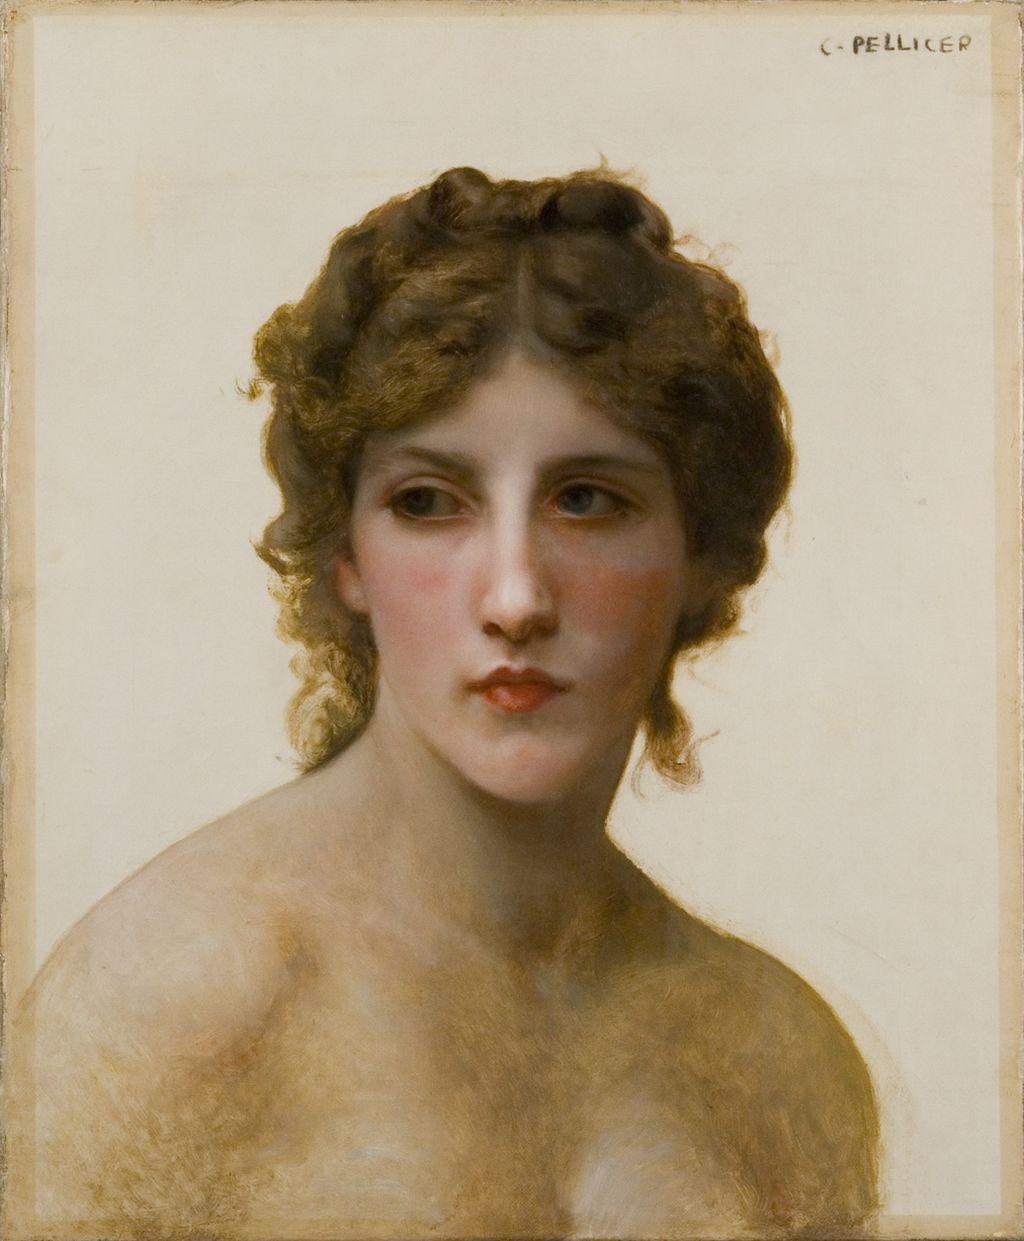 Una jove, Carles Pellicer